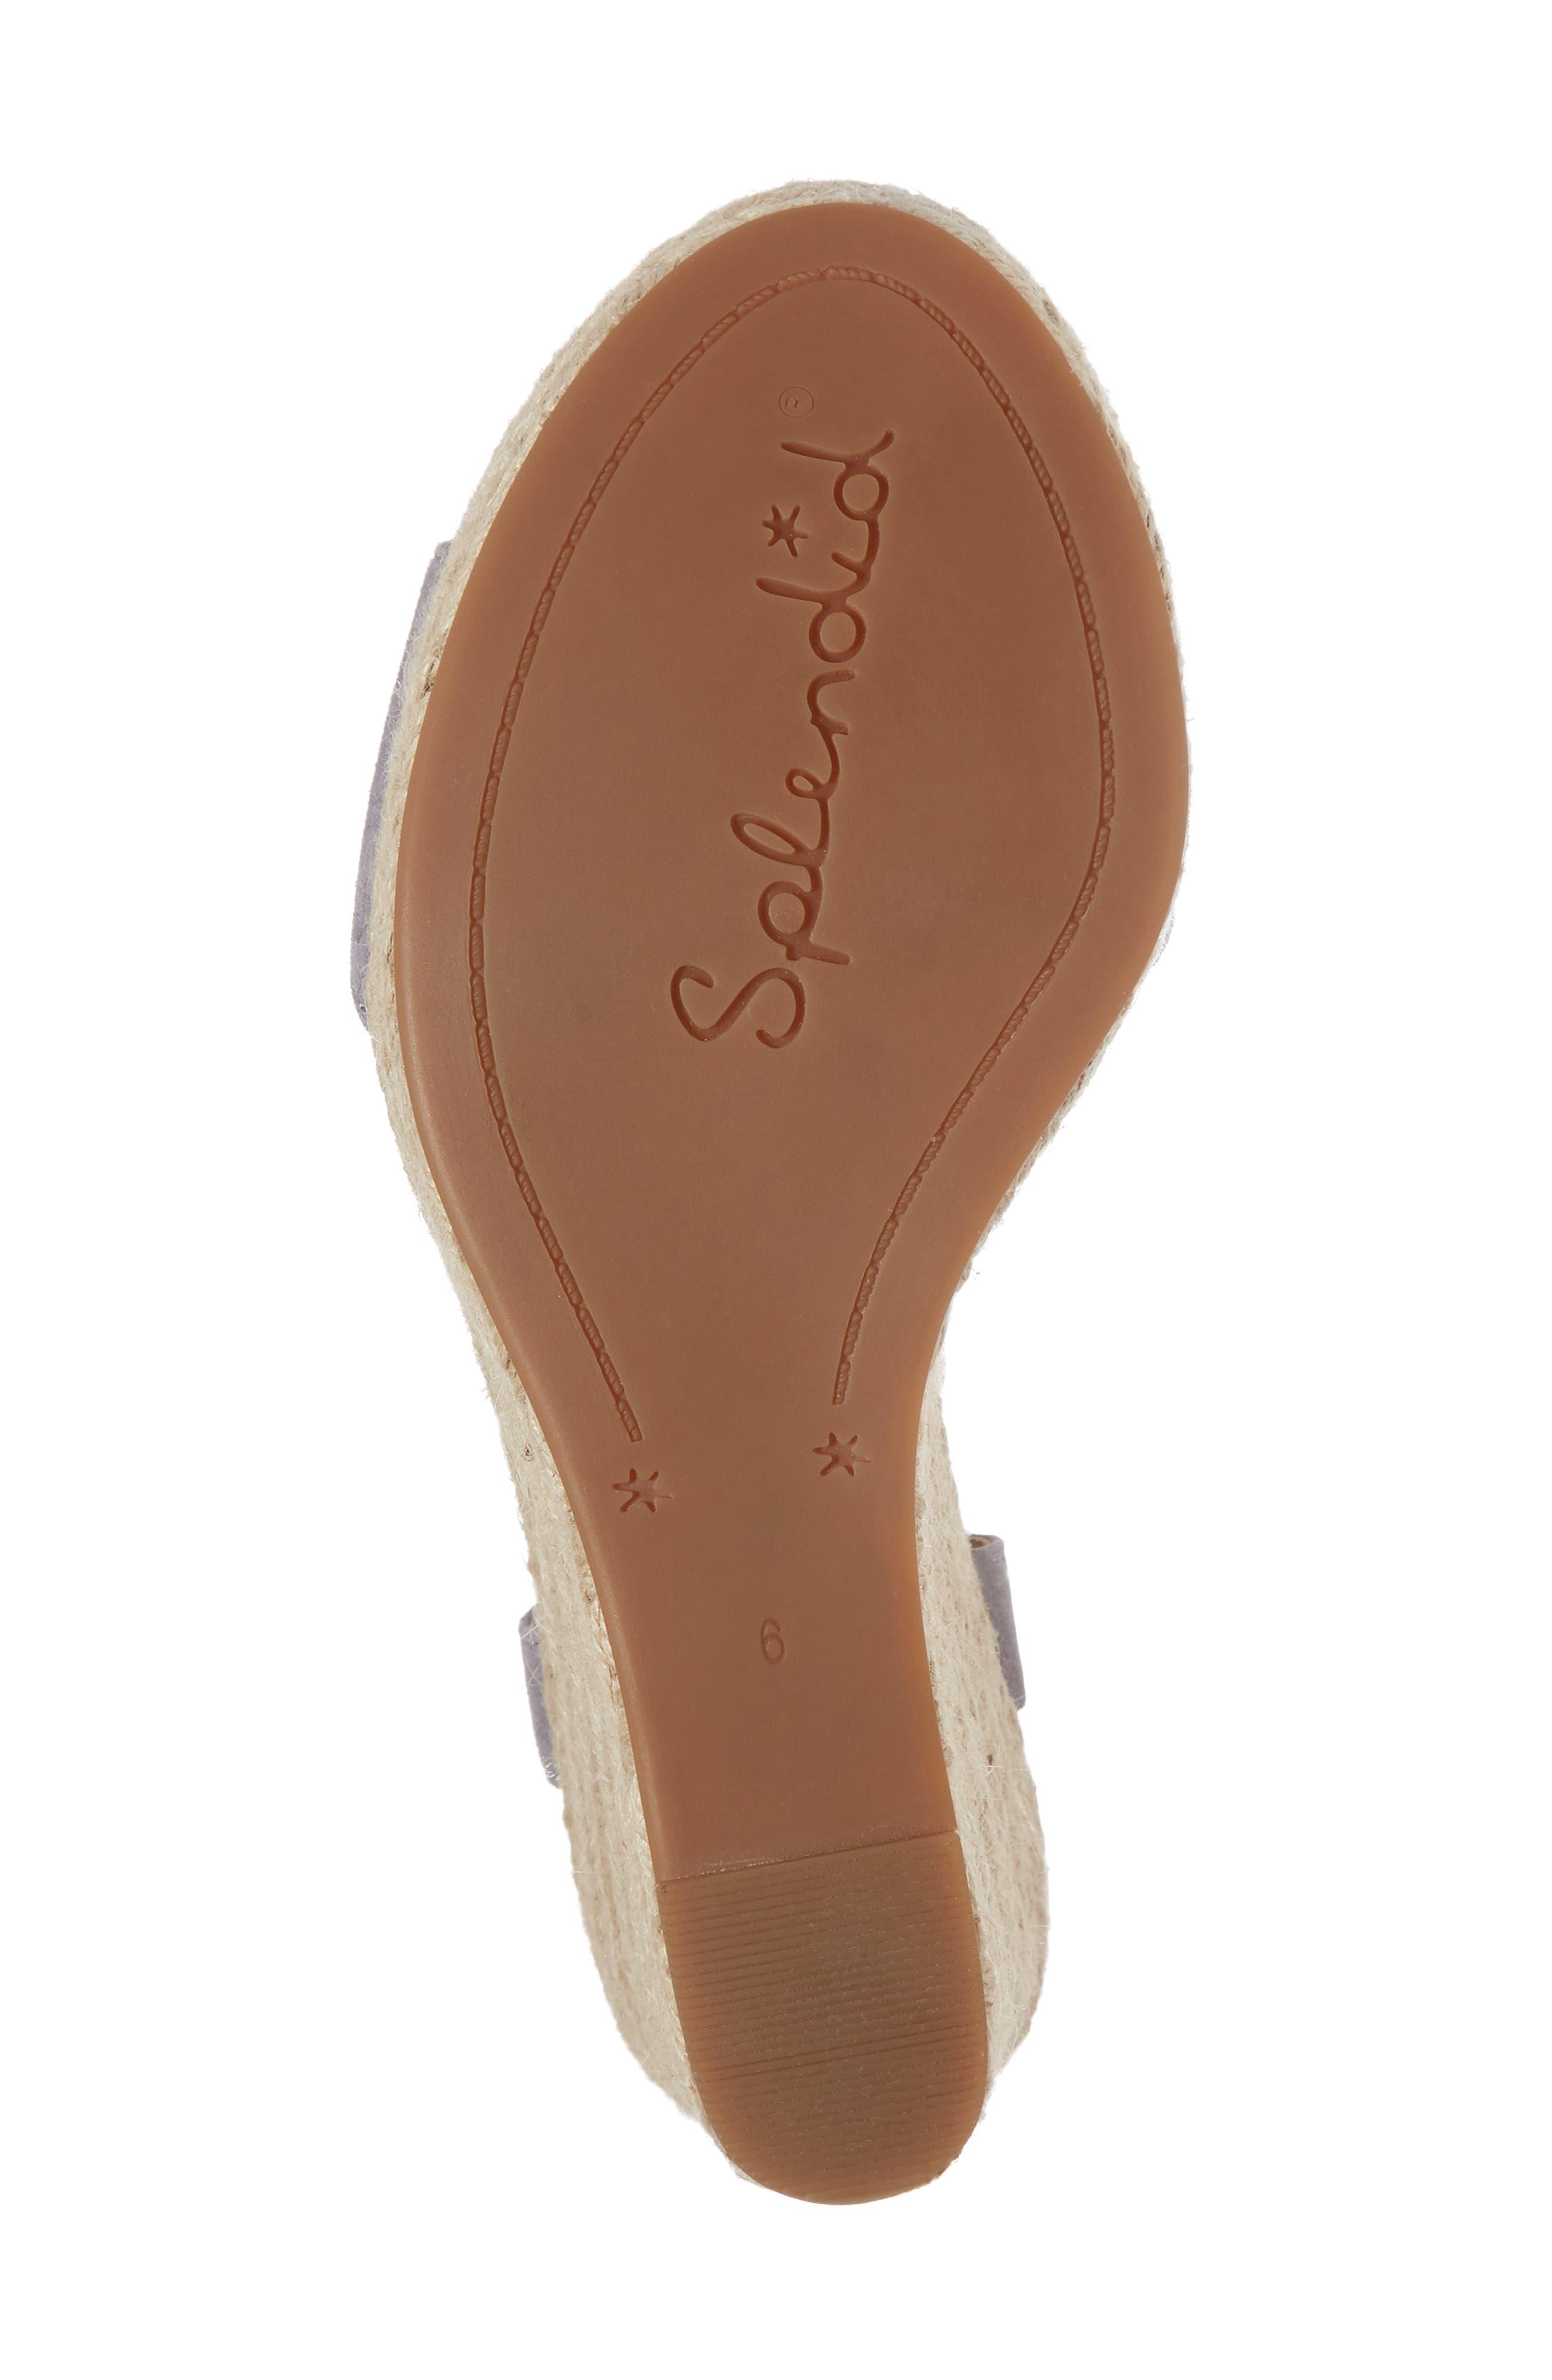 Fianna Espadrille Wedge Sandal,                             Alternate thumbnail 6, color,                             STEEL GREY SUEDE